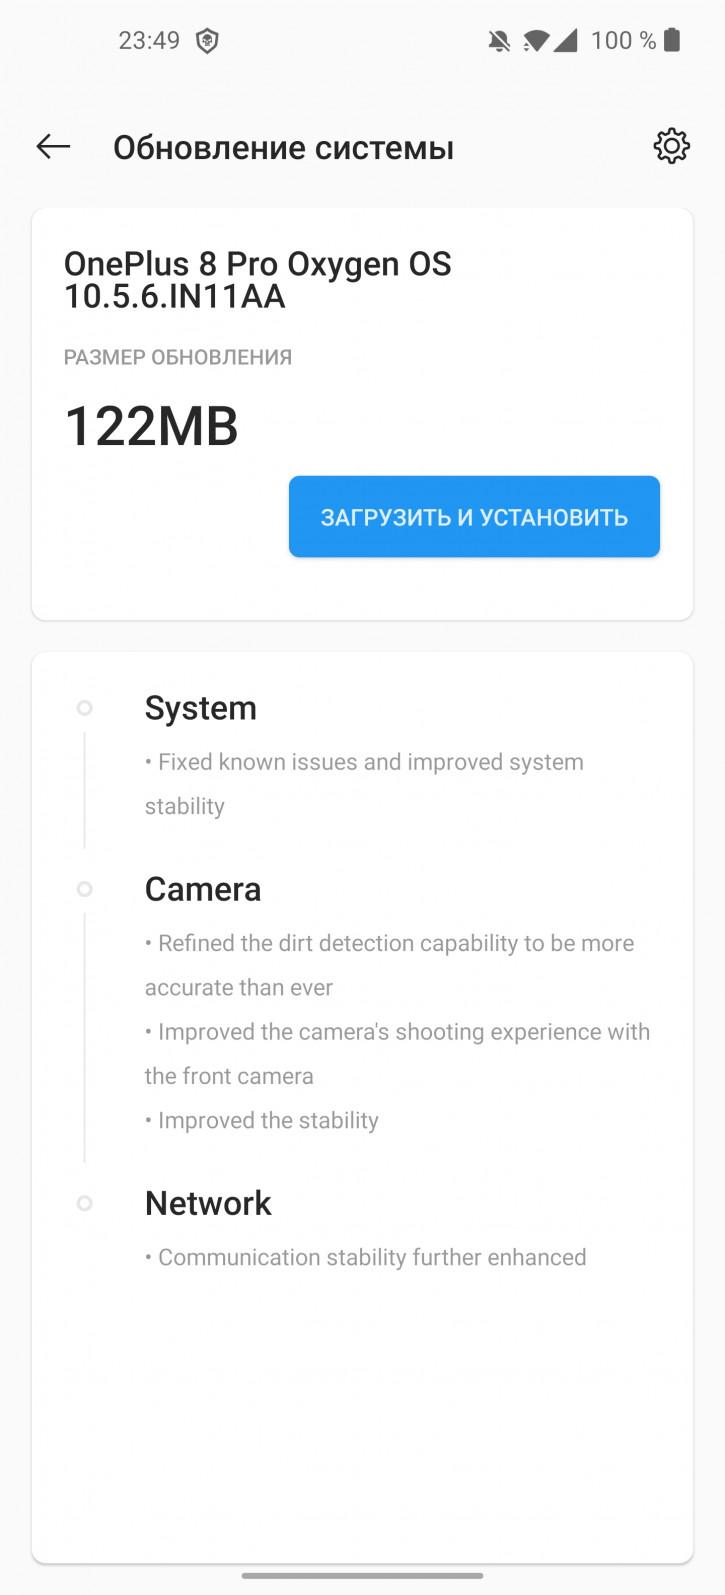 OnePlus 8 Pro получил еще один апдейт для камеры